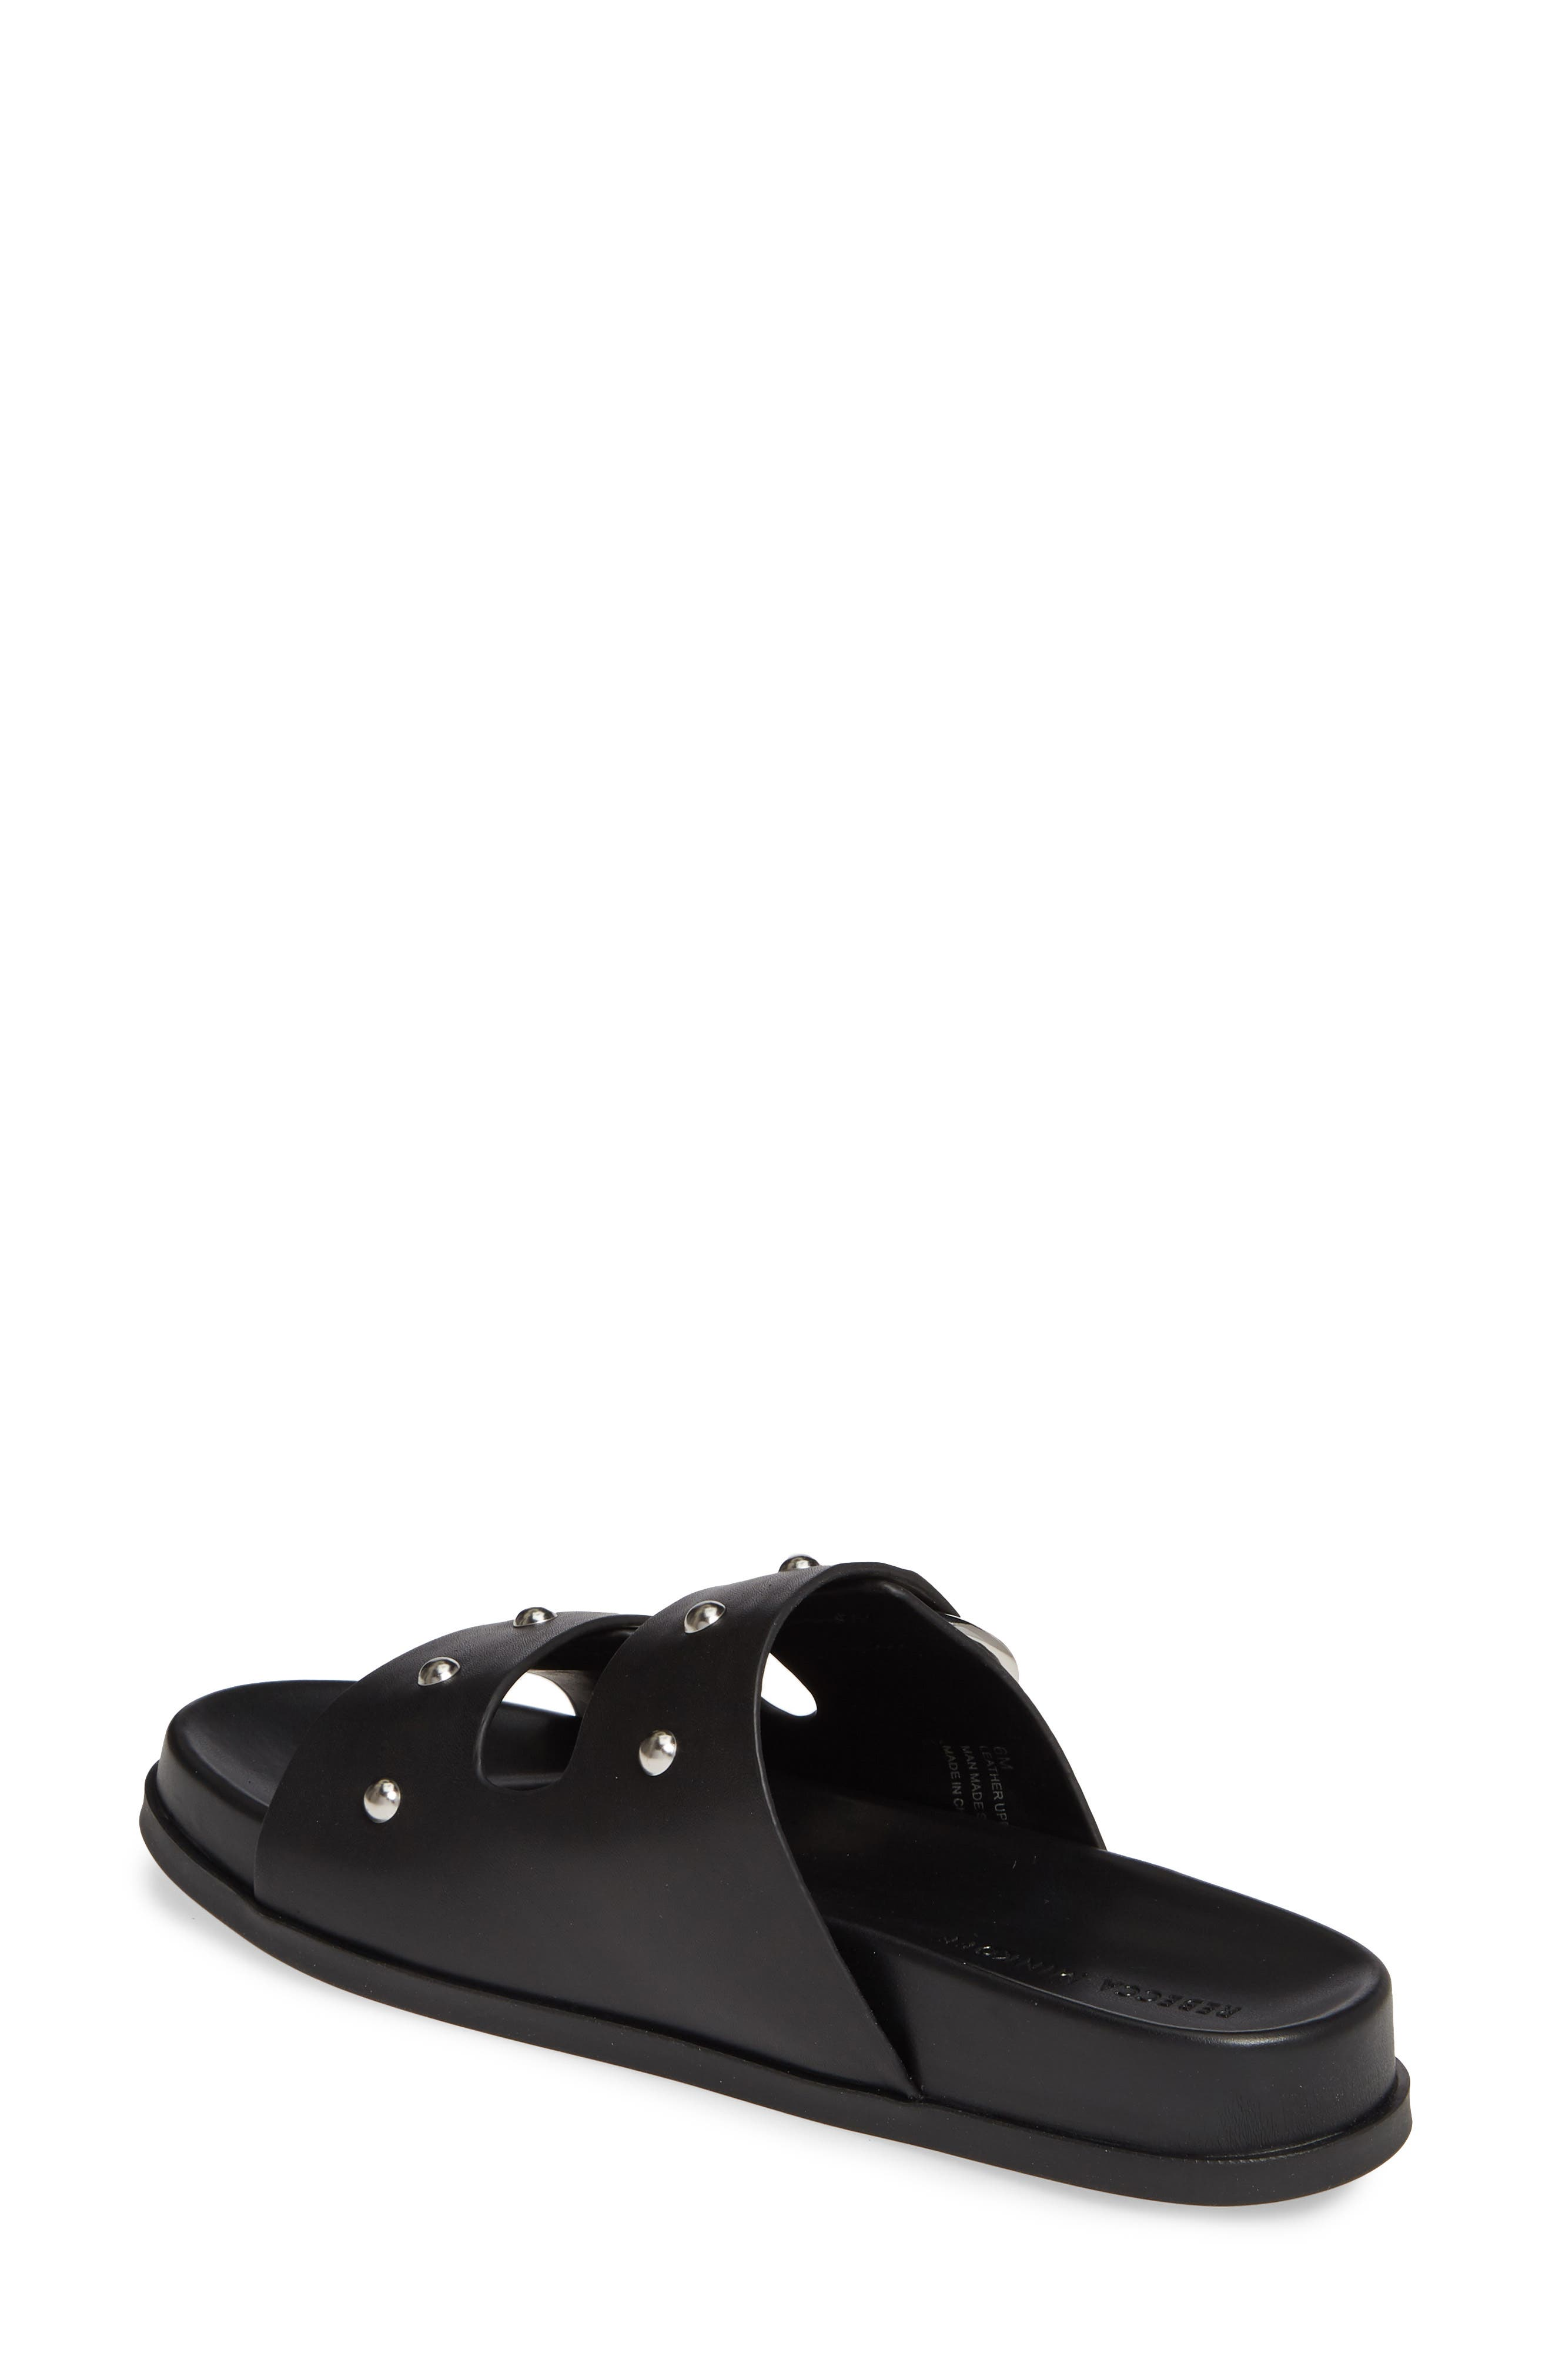 REBECCA MINKOFF, Vachel Slide Sandal, Alternate thumbnail 2, color, BLACK LEATHER